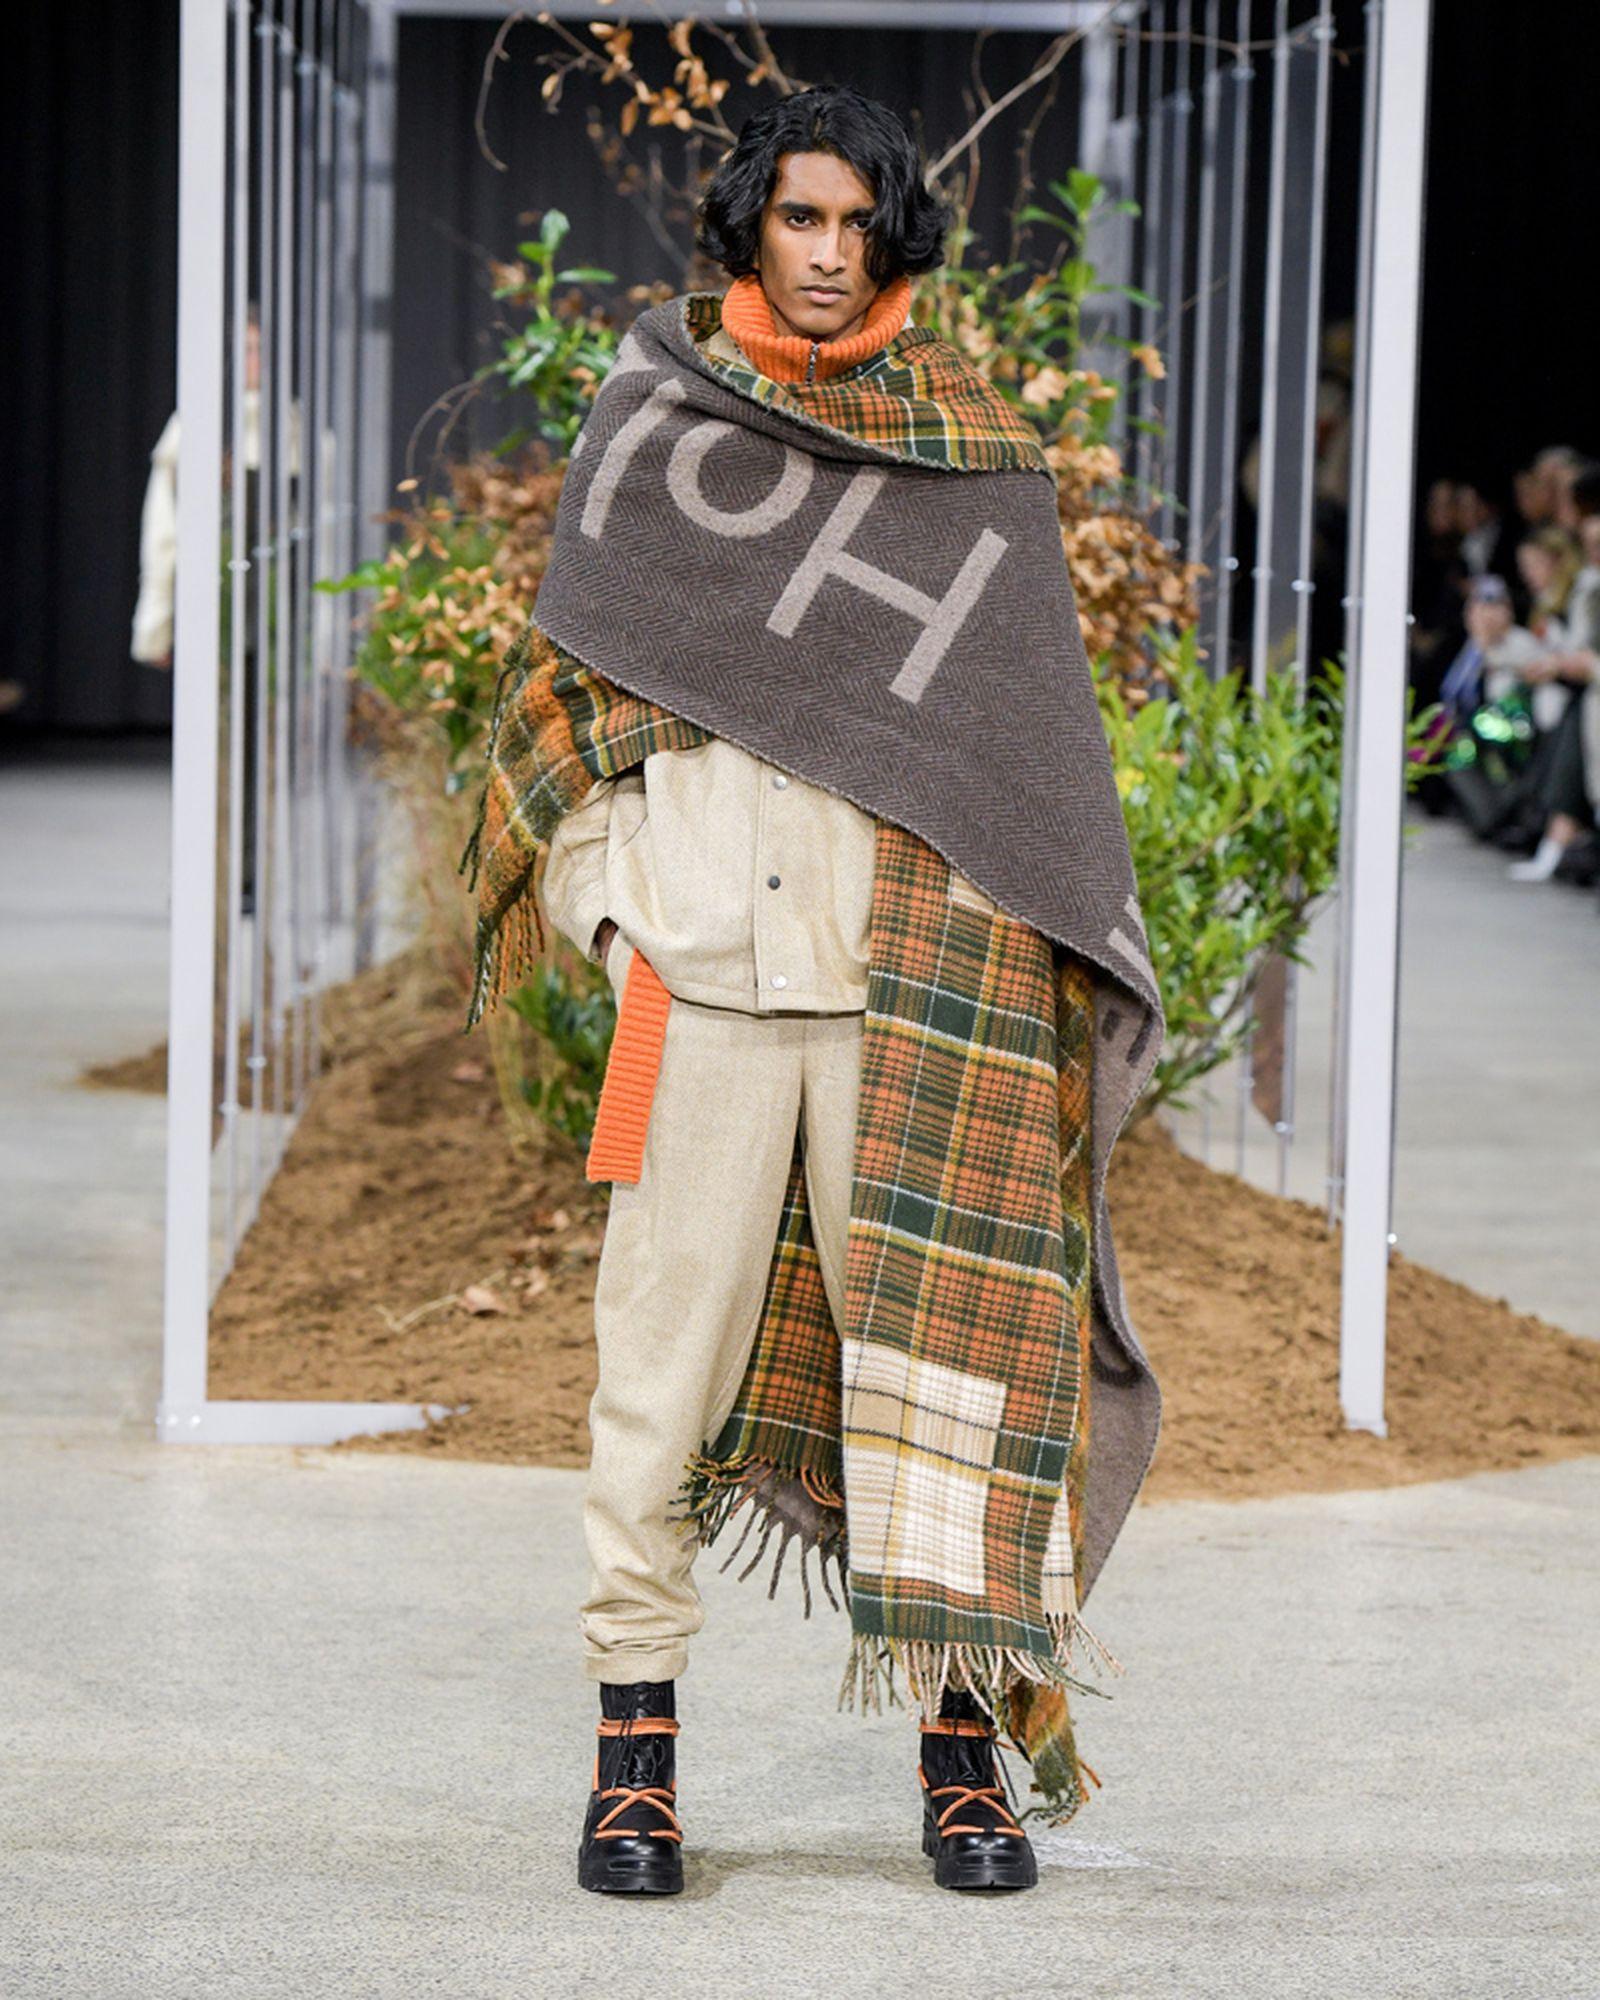 future-fashion-week-copenhagen-holz-3